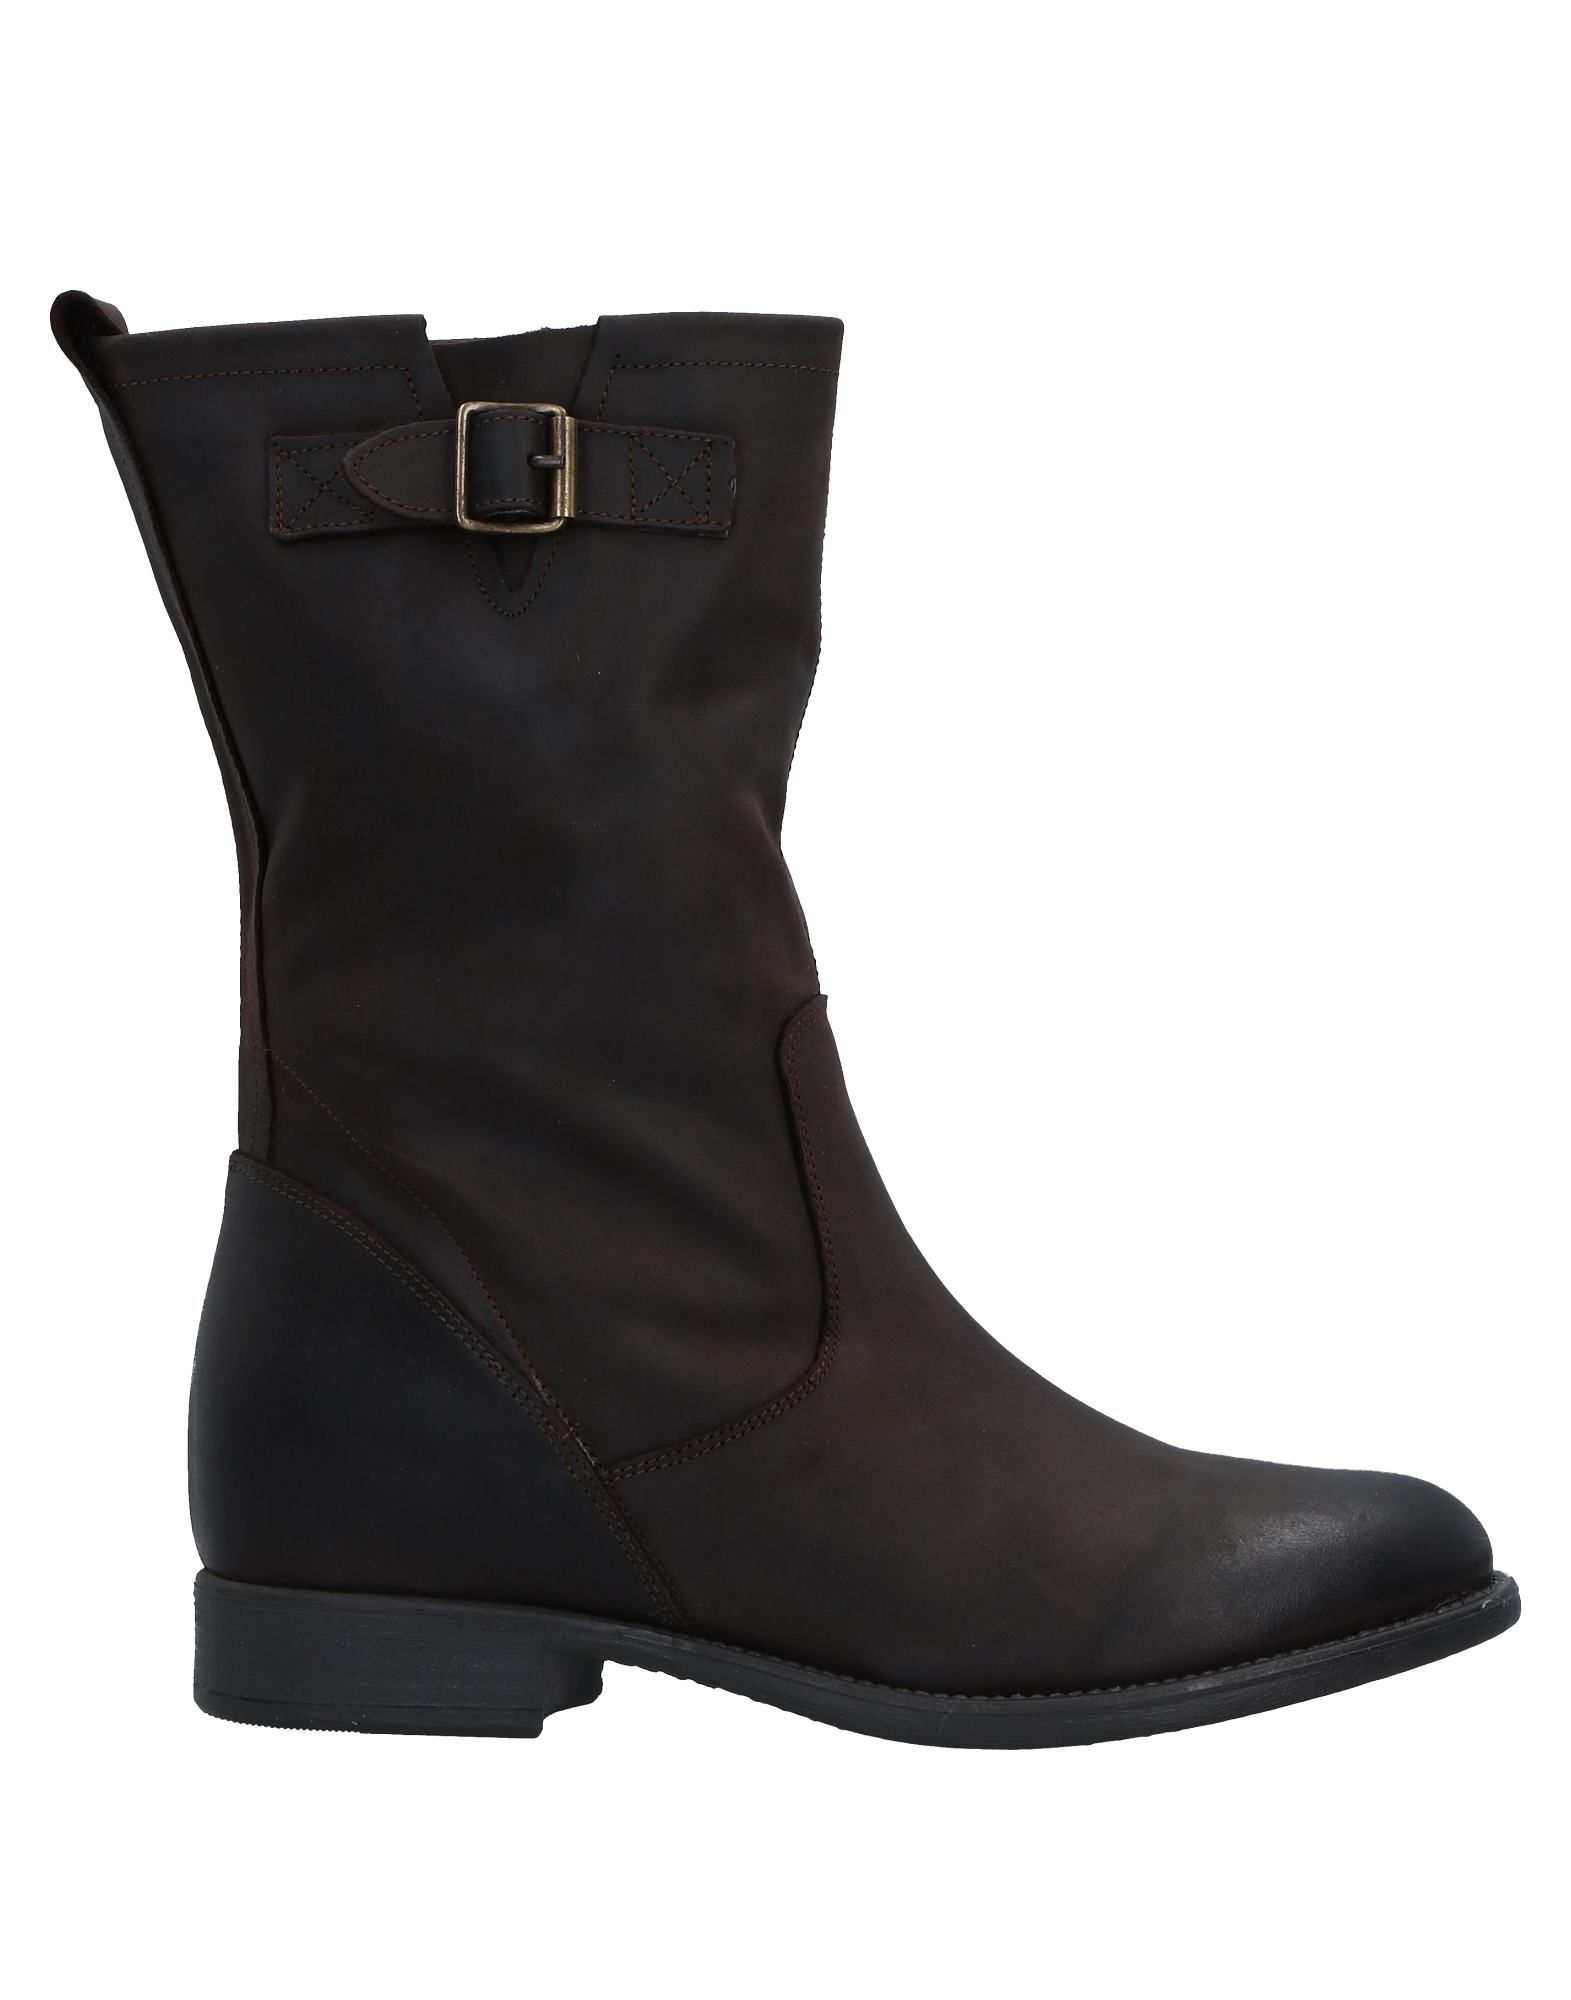 Jada Simon Stiefelette Damen    11538100QJ Gute Qualität beliebte Schuhe 38ff39